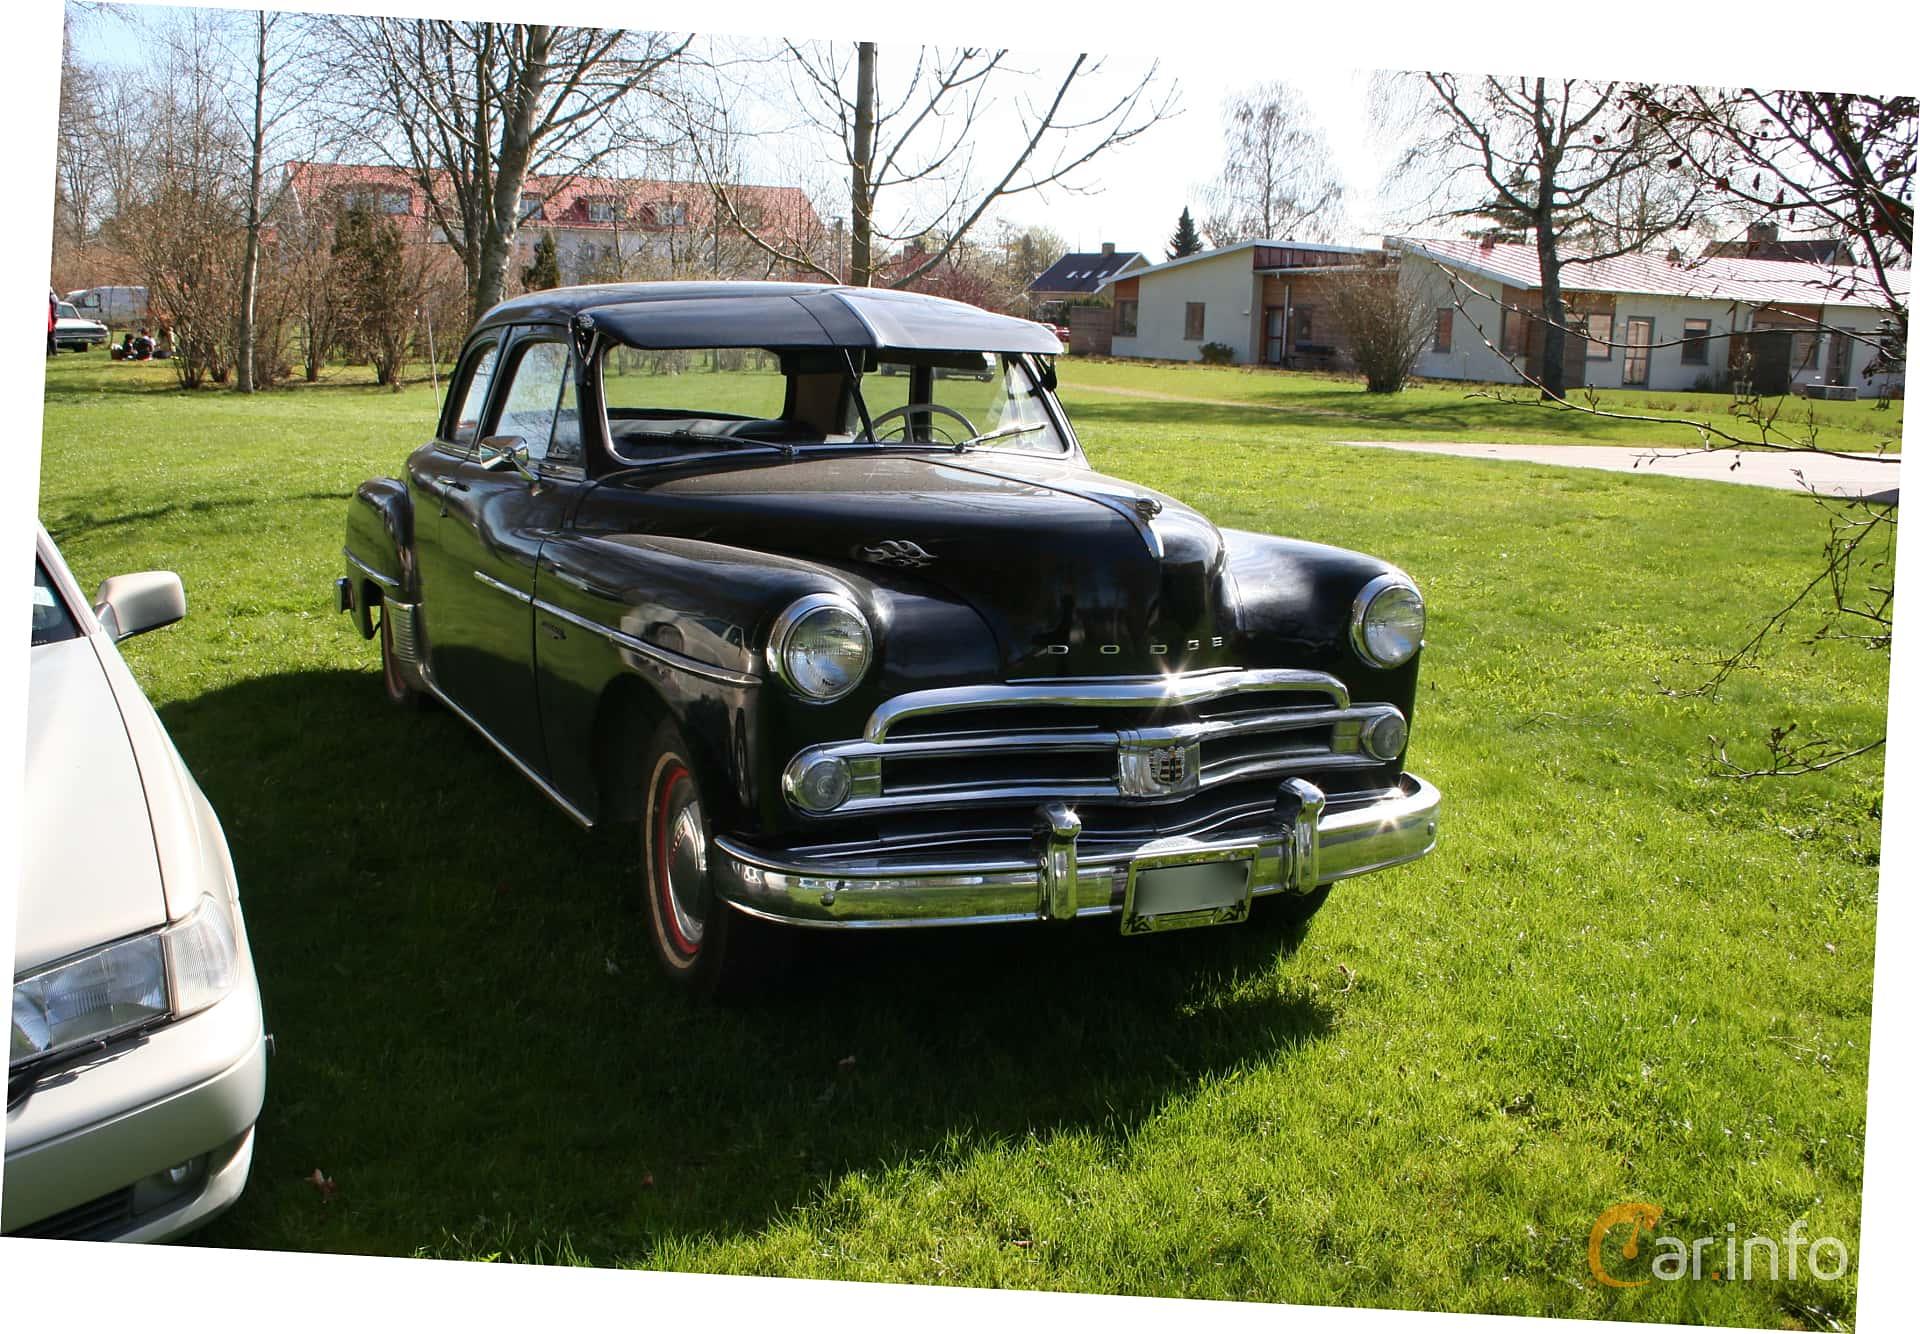 Dodge Coronet Club Coupé 3.8 Manual, 105hp, 1950